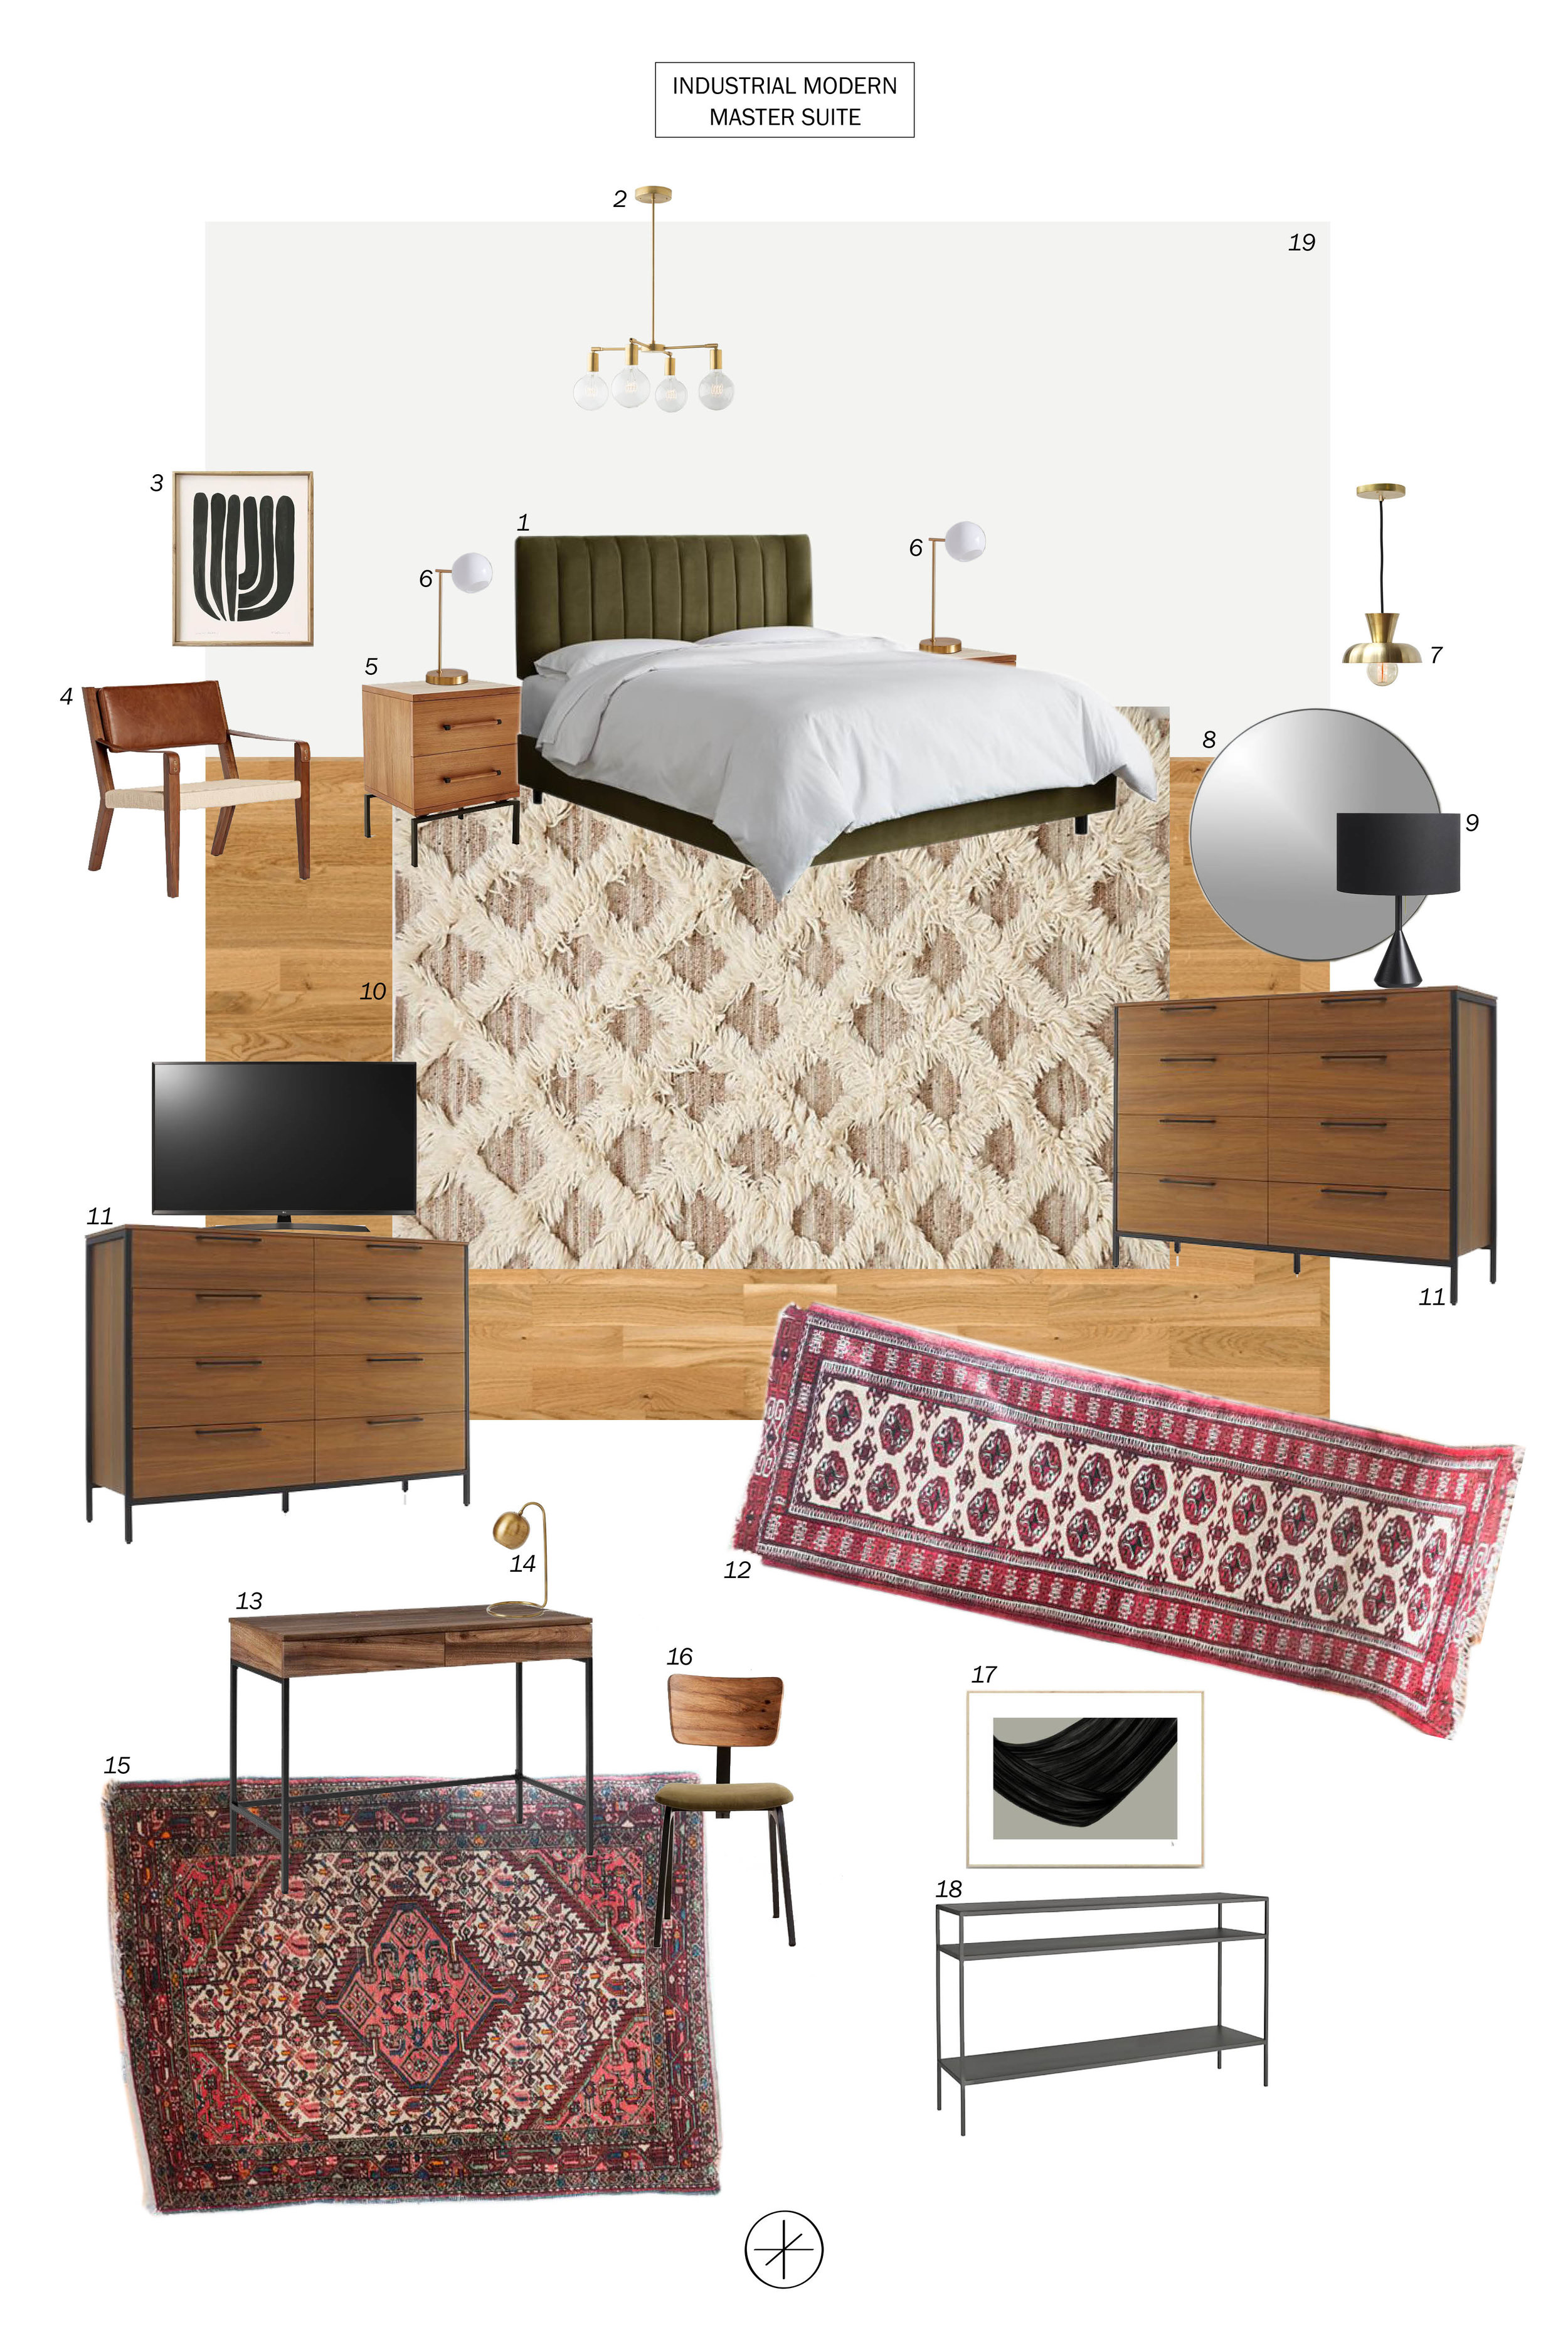 Industrial Modern Master Suite by Casework Interior Design